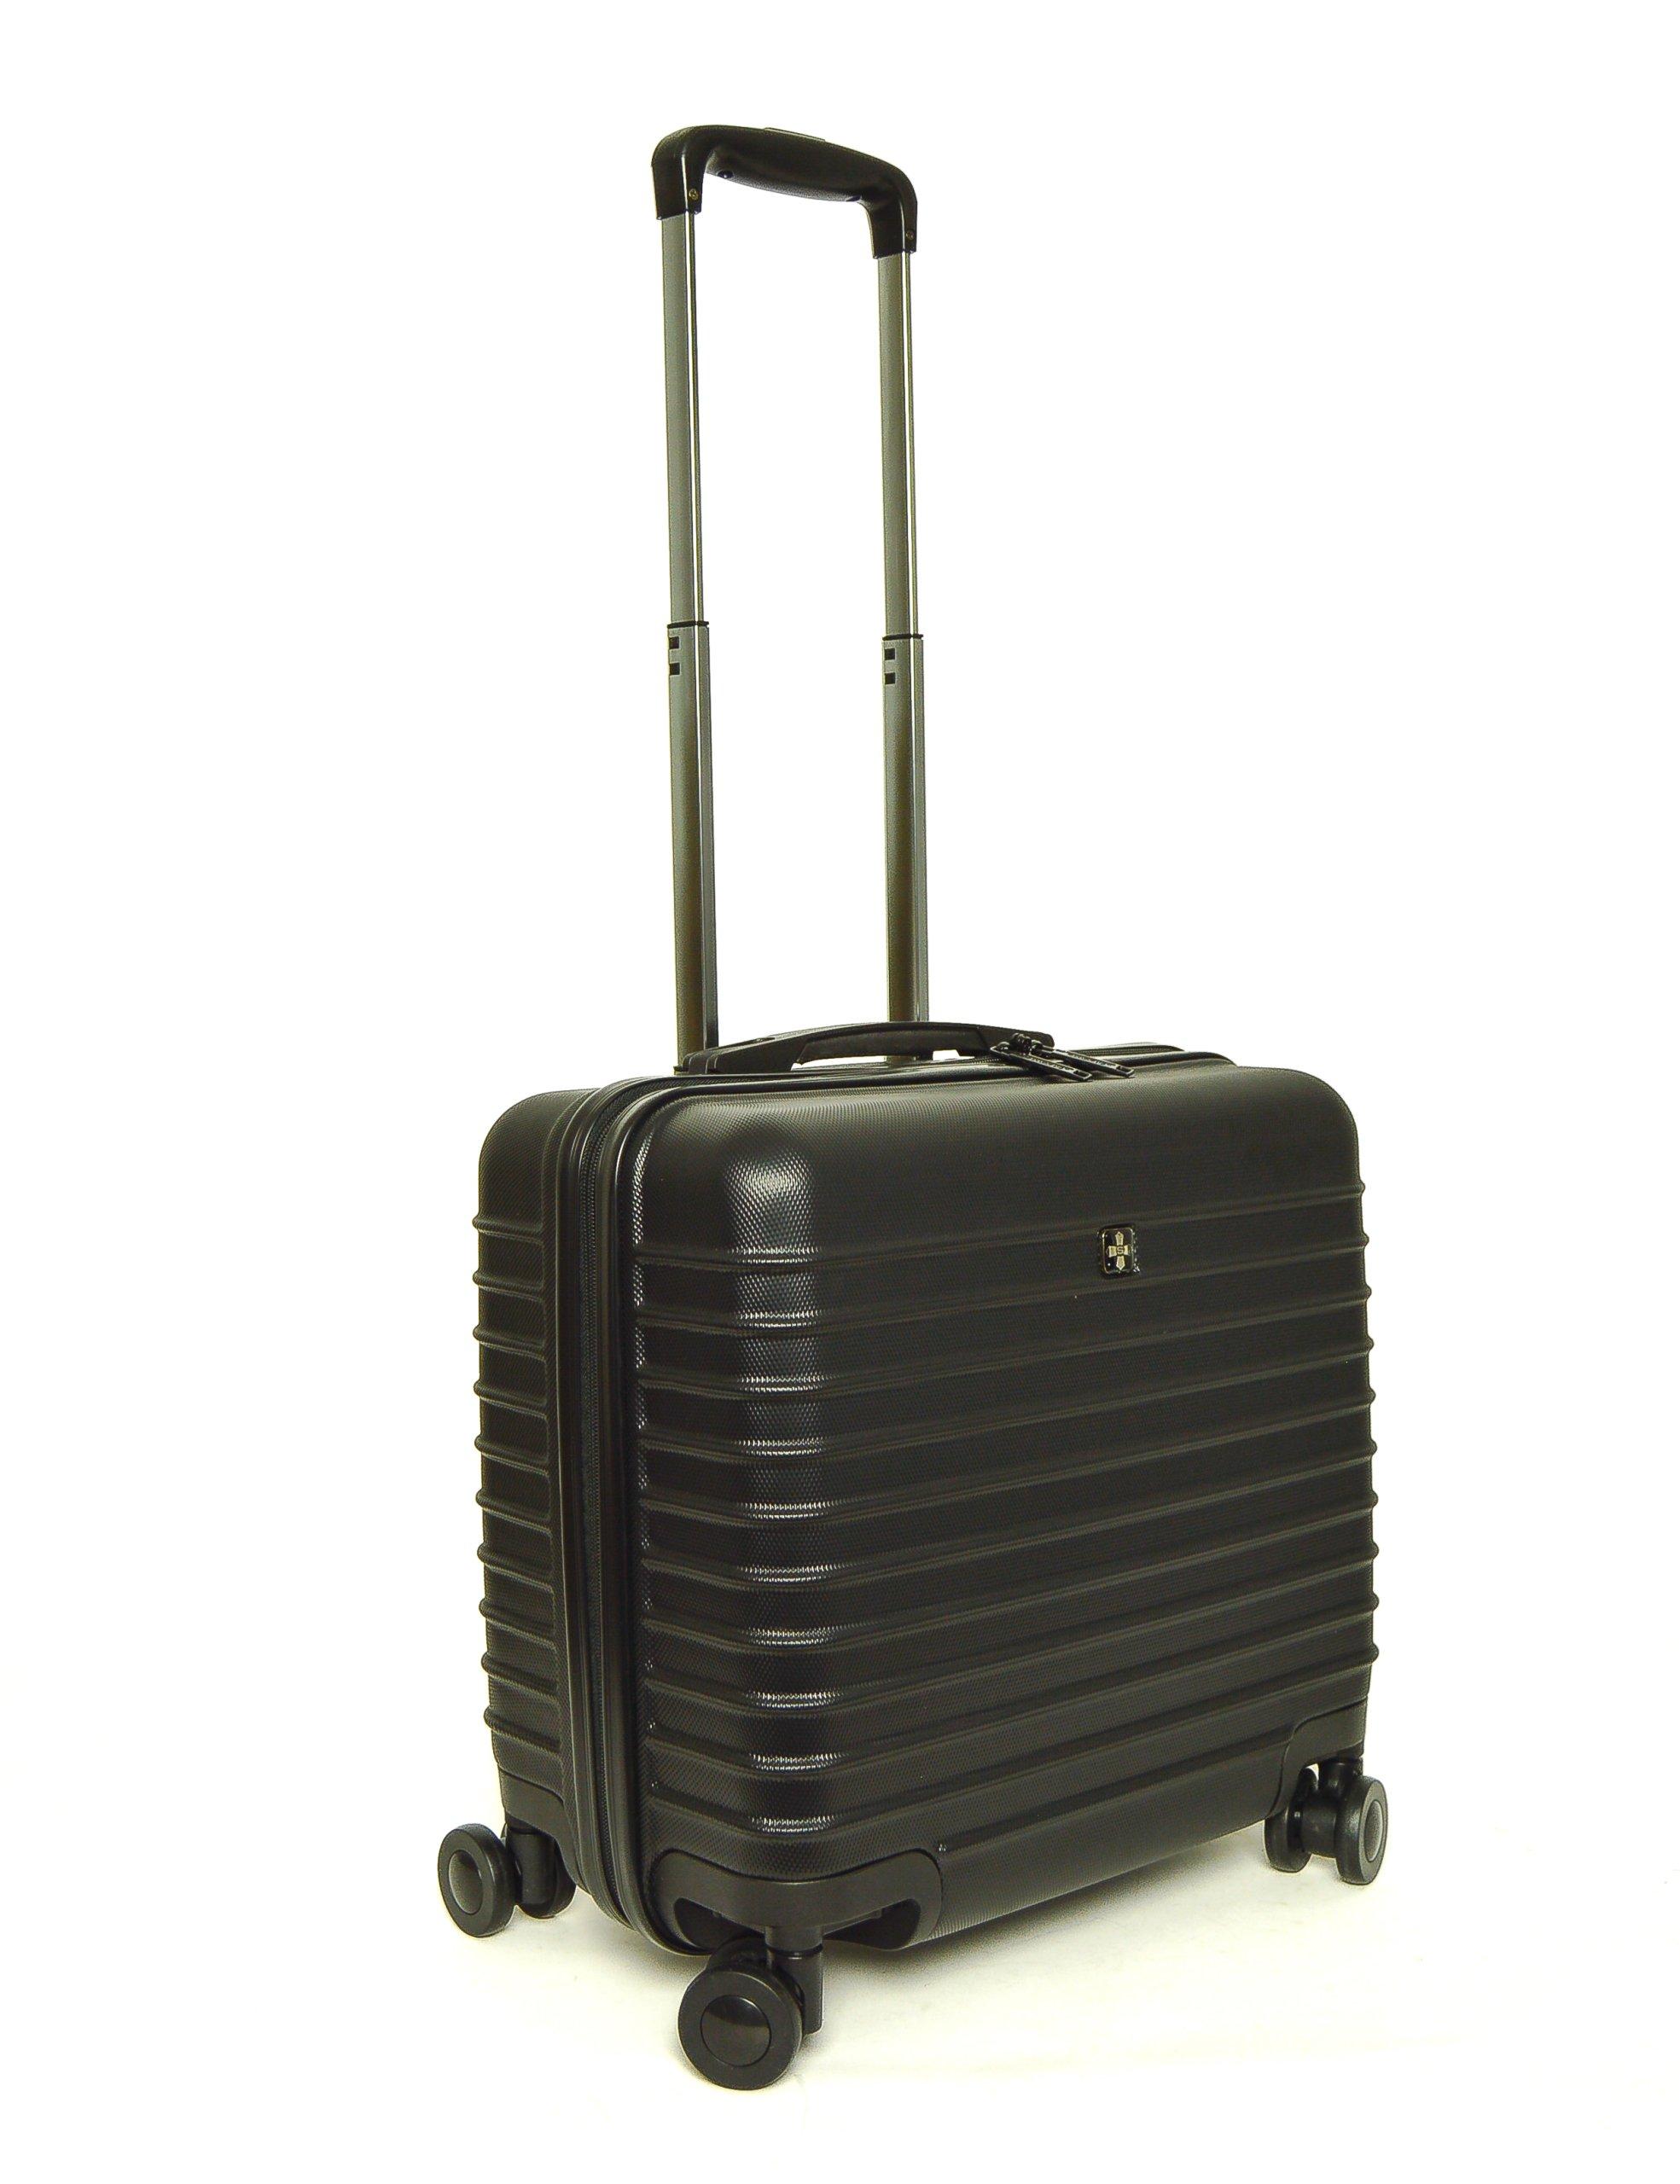 f1dcb53512b42 Pilotka super walizka twarda 4 kółka SWISS CONCEPT - 7262256441 ...